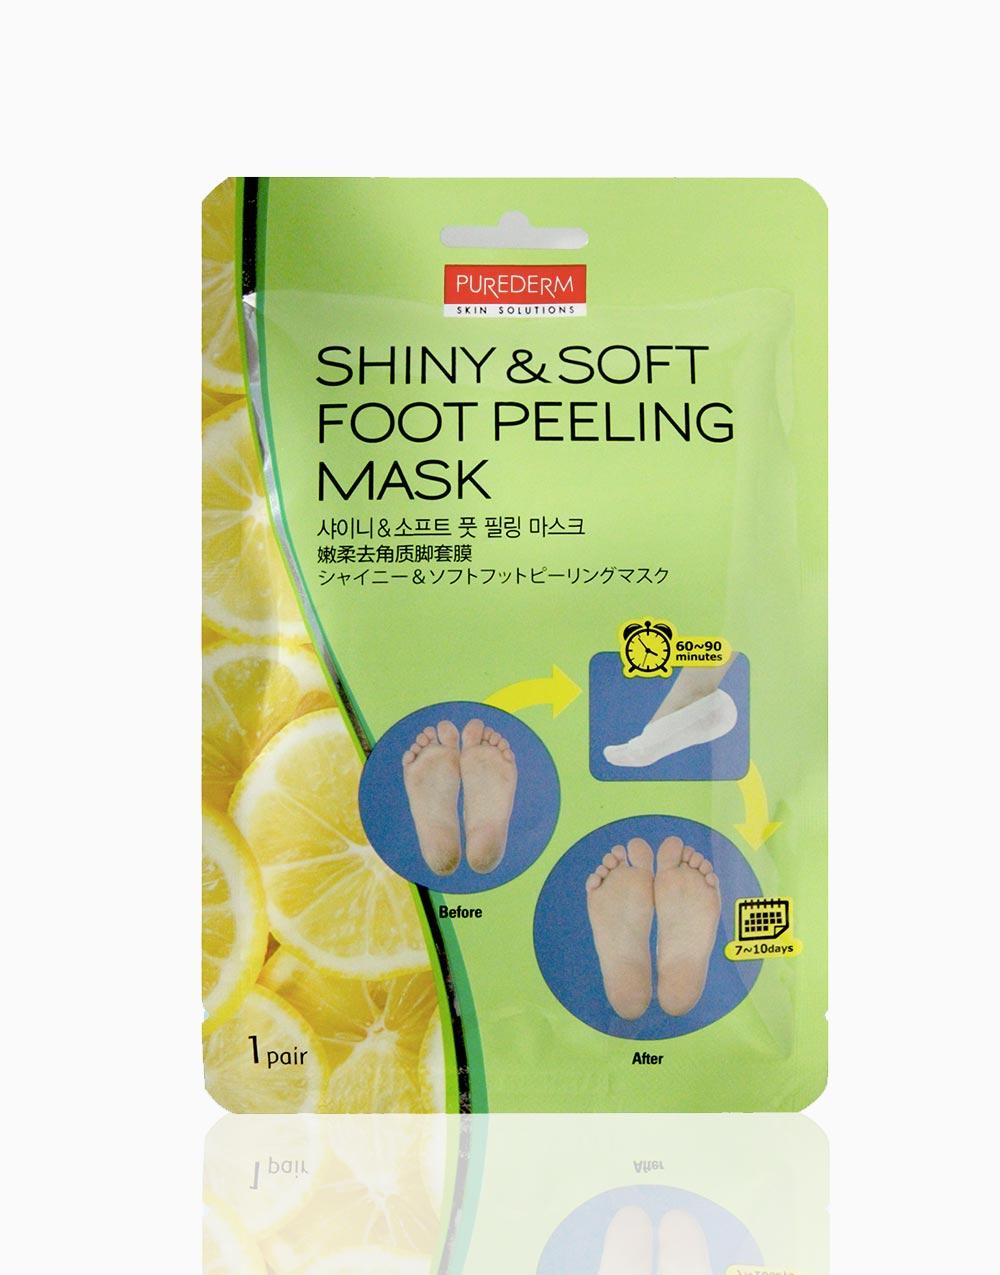 Shiny & Soft Foot Peeling Mask by Purederm